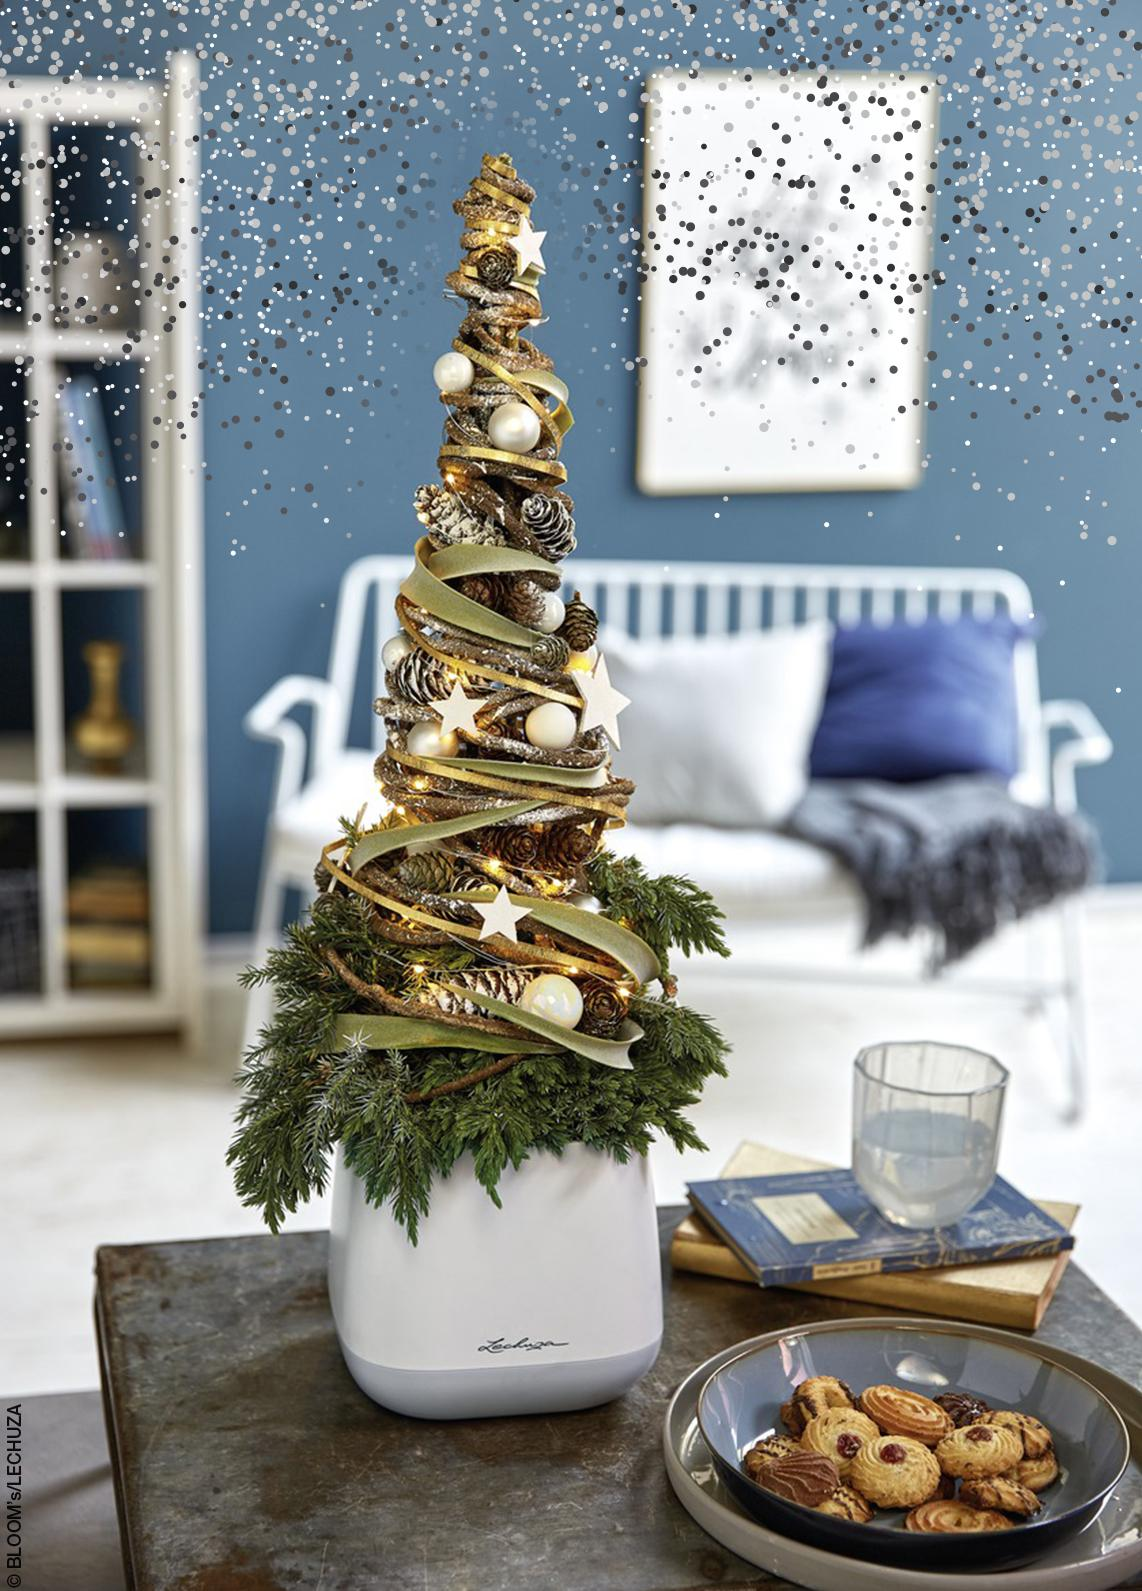 LECHUZA YULA Pflanzgefäß mit Weihnachtsgesteck